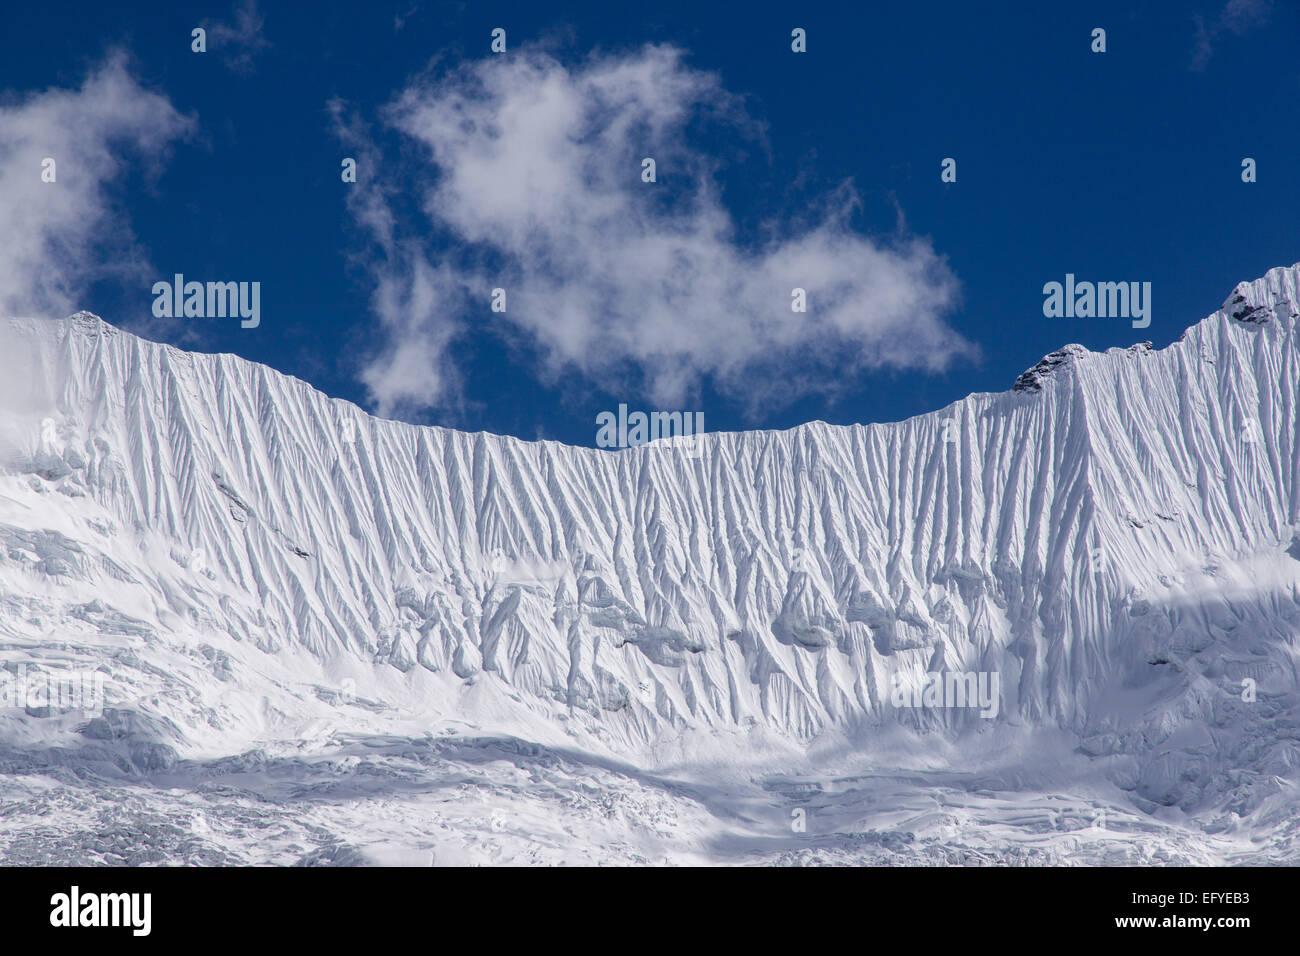 Kali Himal in the Khumbu region of the Himalayas of Nepal - Stock Image